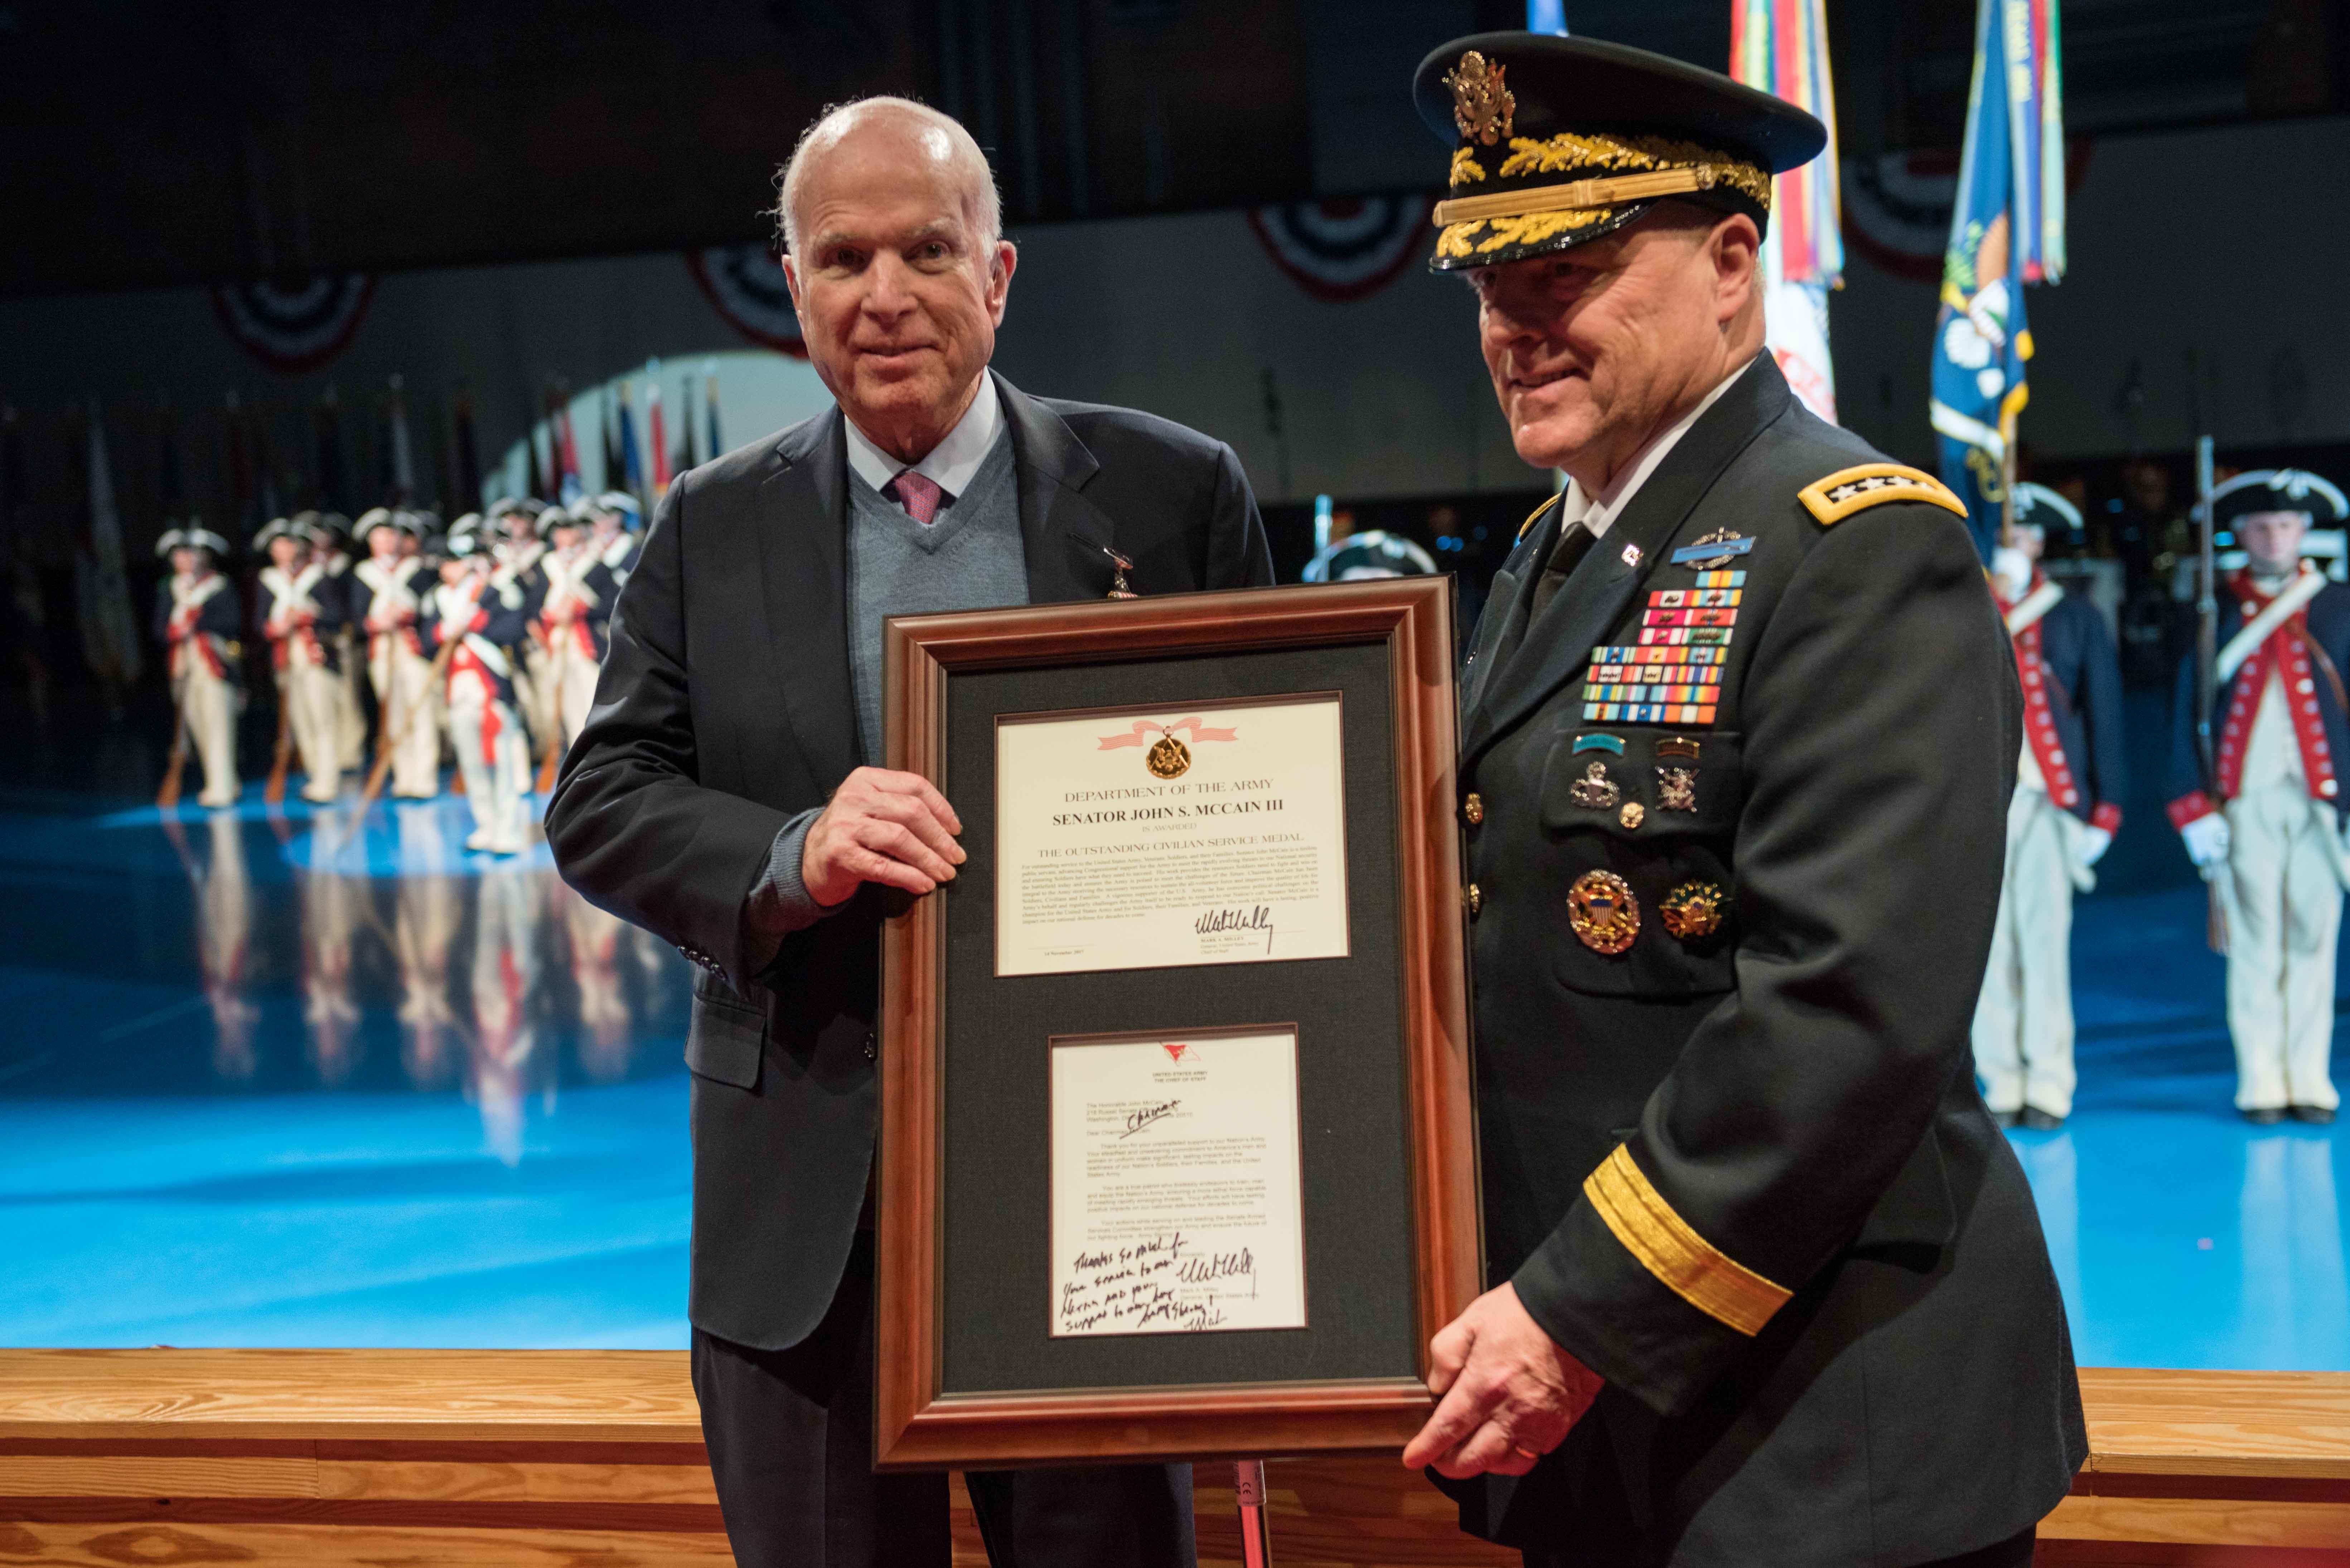 Senator McCain Salute 14 Nov. 2017 (3).jpg